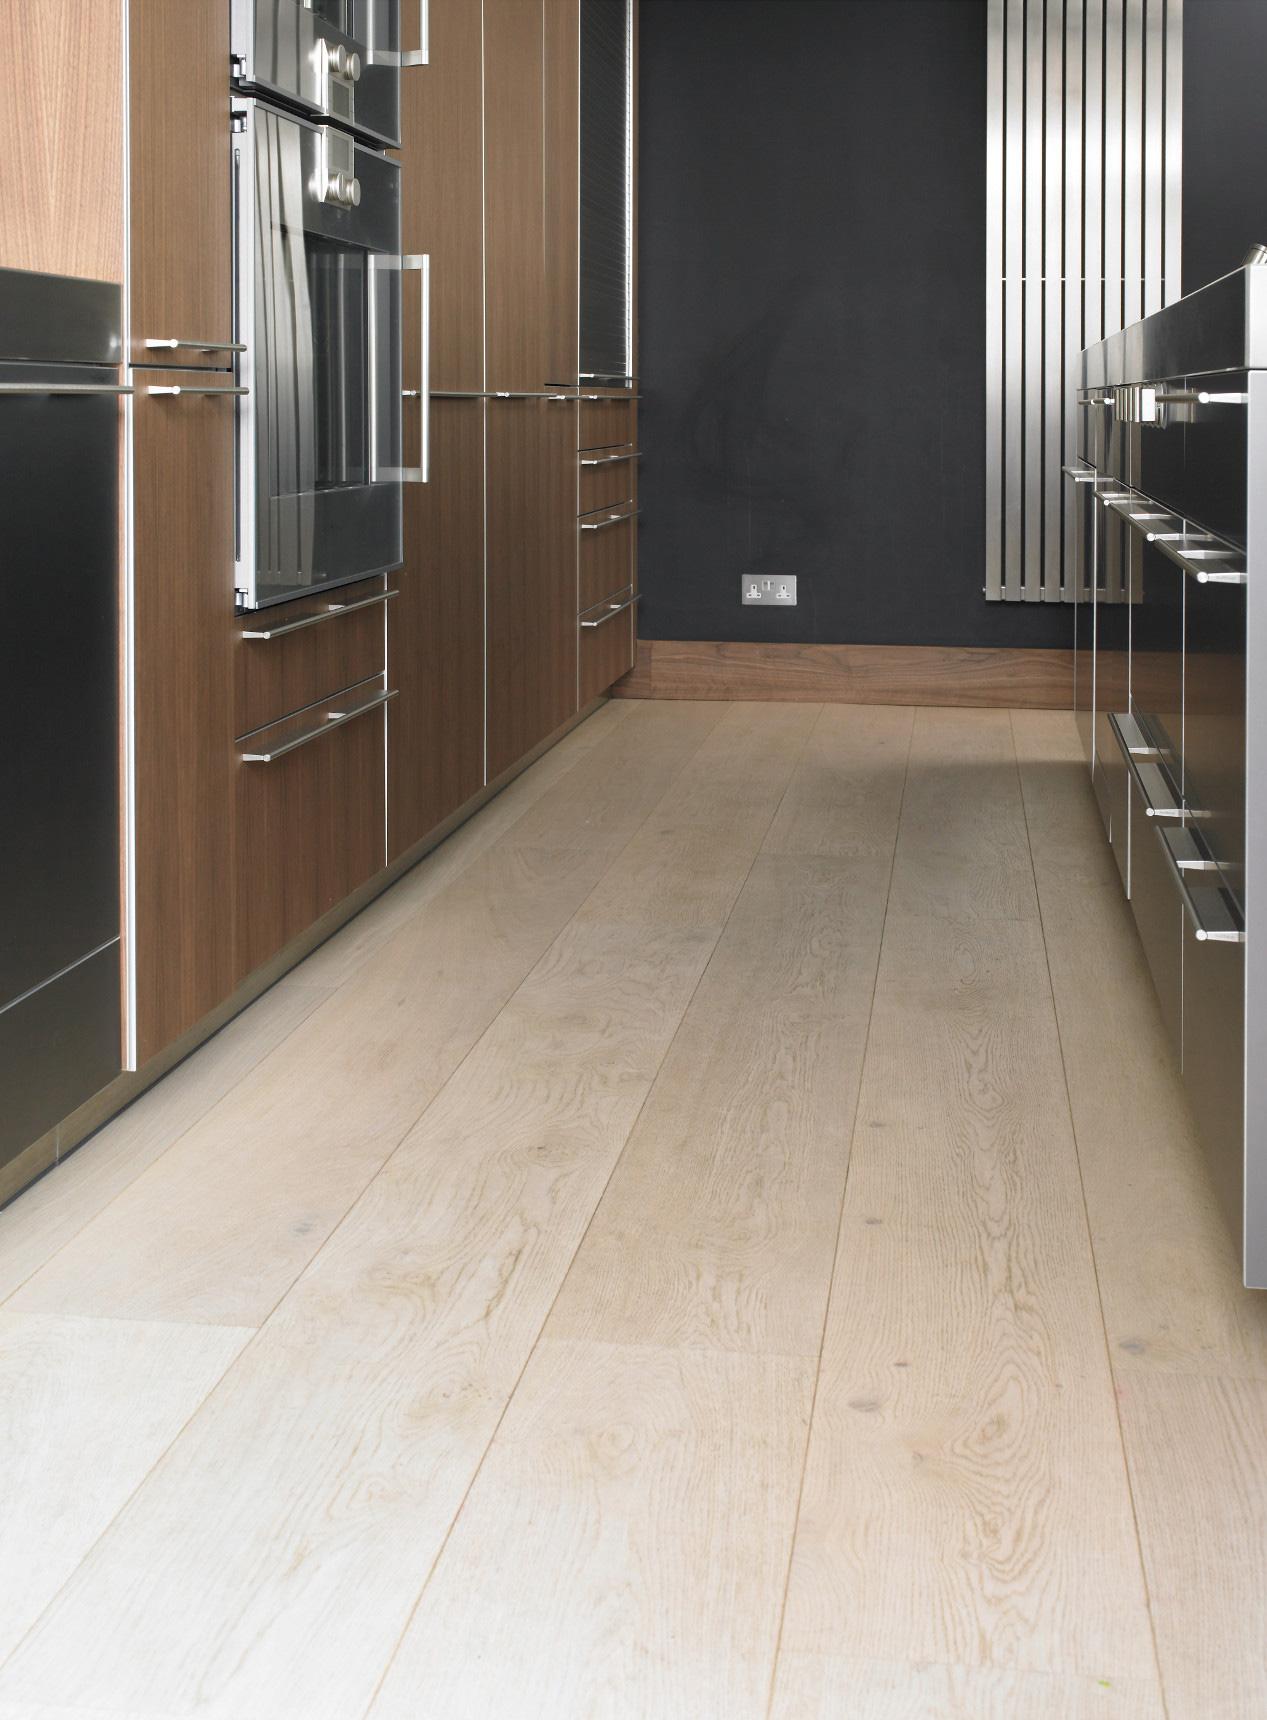 Oak polar white plank in kitchen with wall radiator